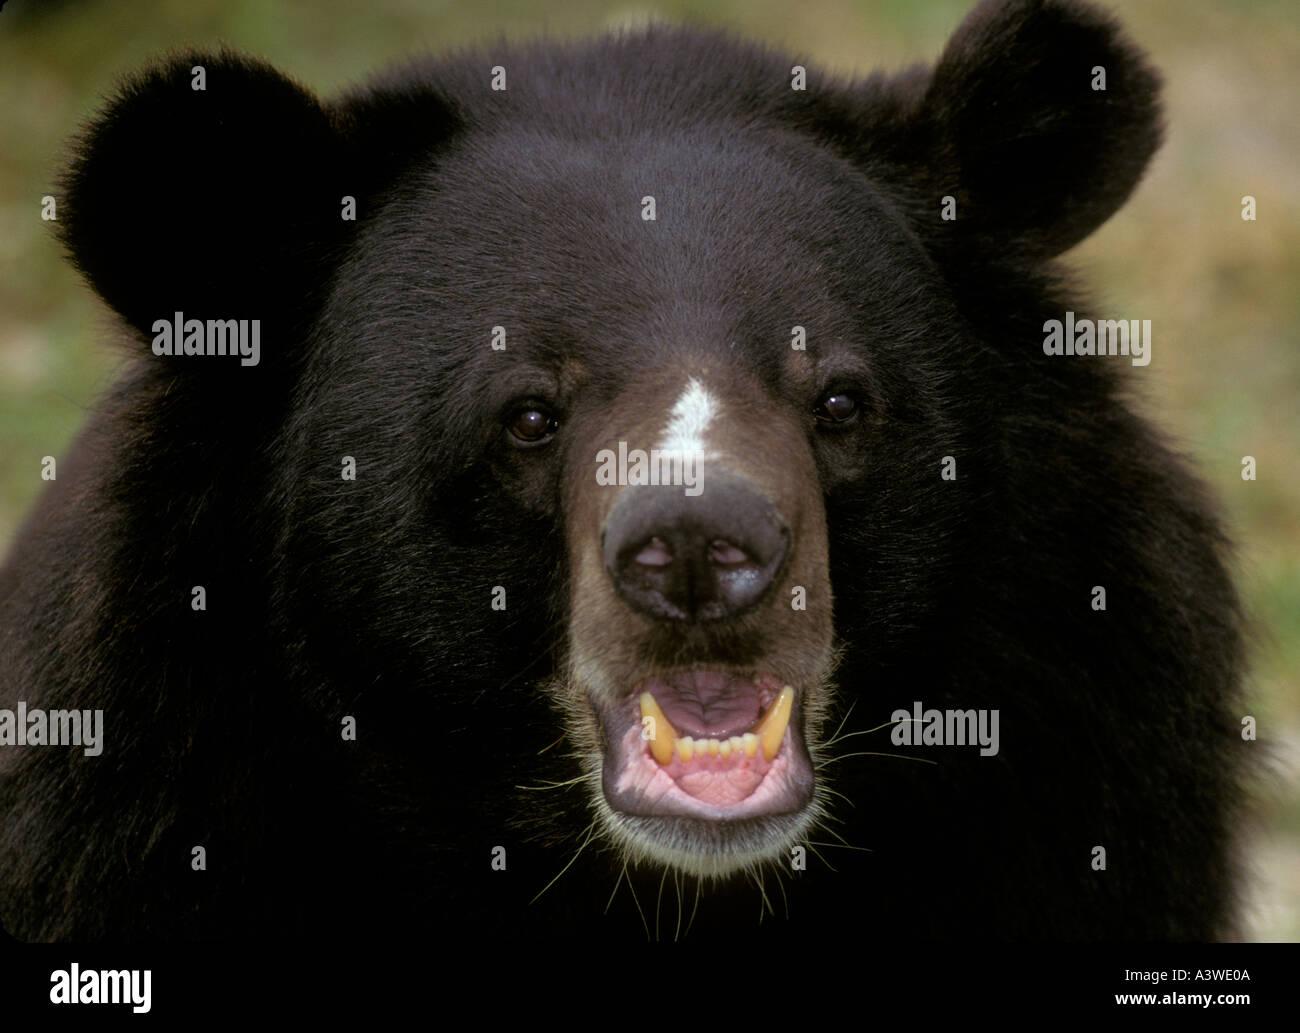 HIMALAYAN BLACK BEAR (Selenarctos thibetanus) CAPTIVE portrait - Stock Image